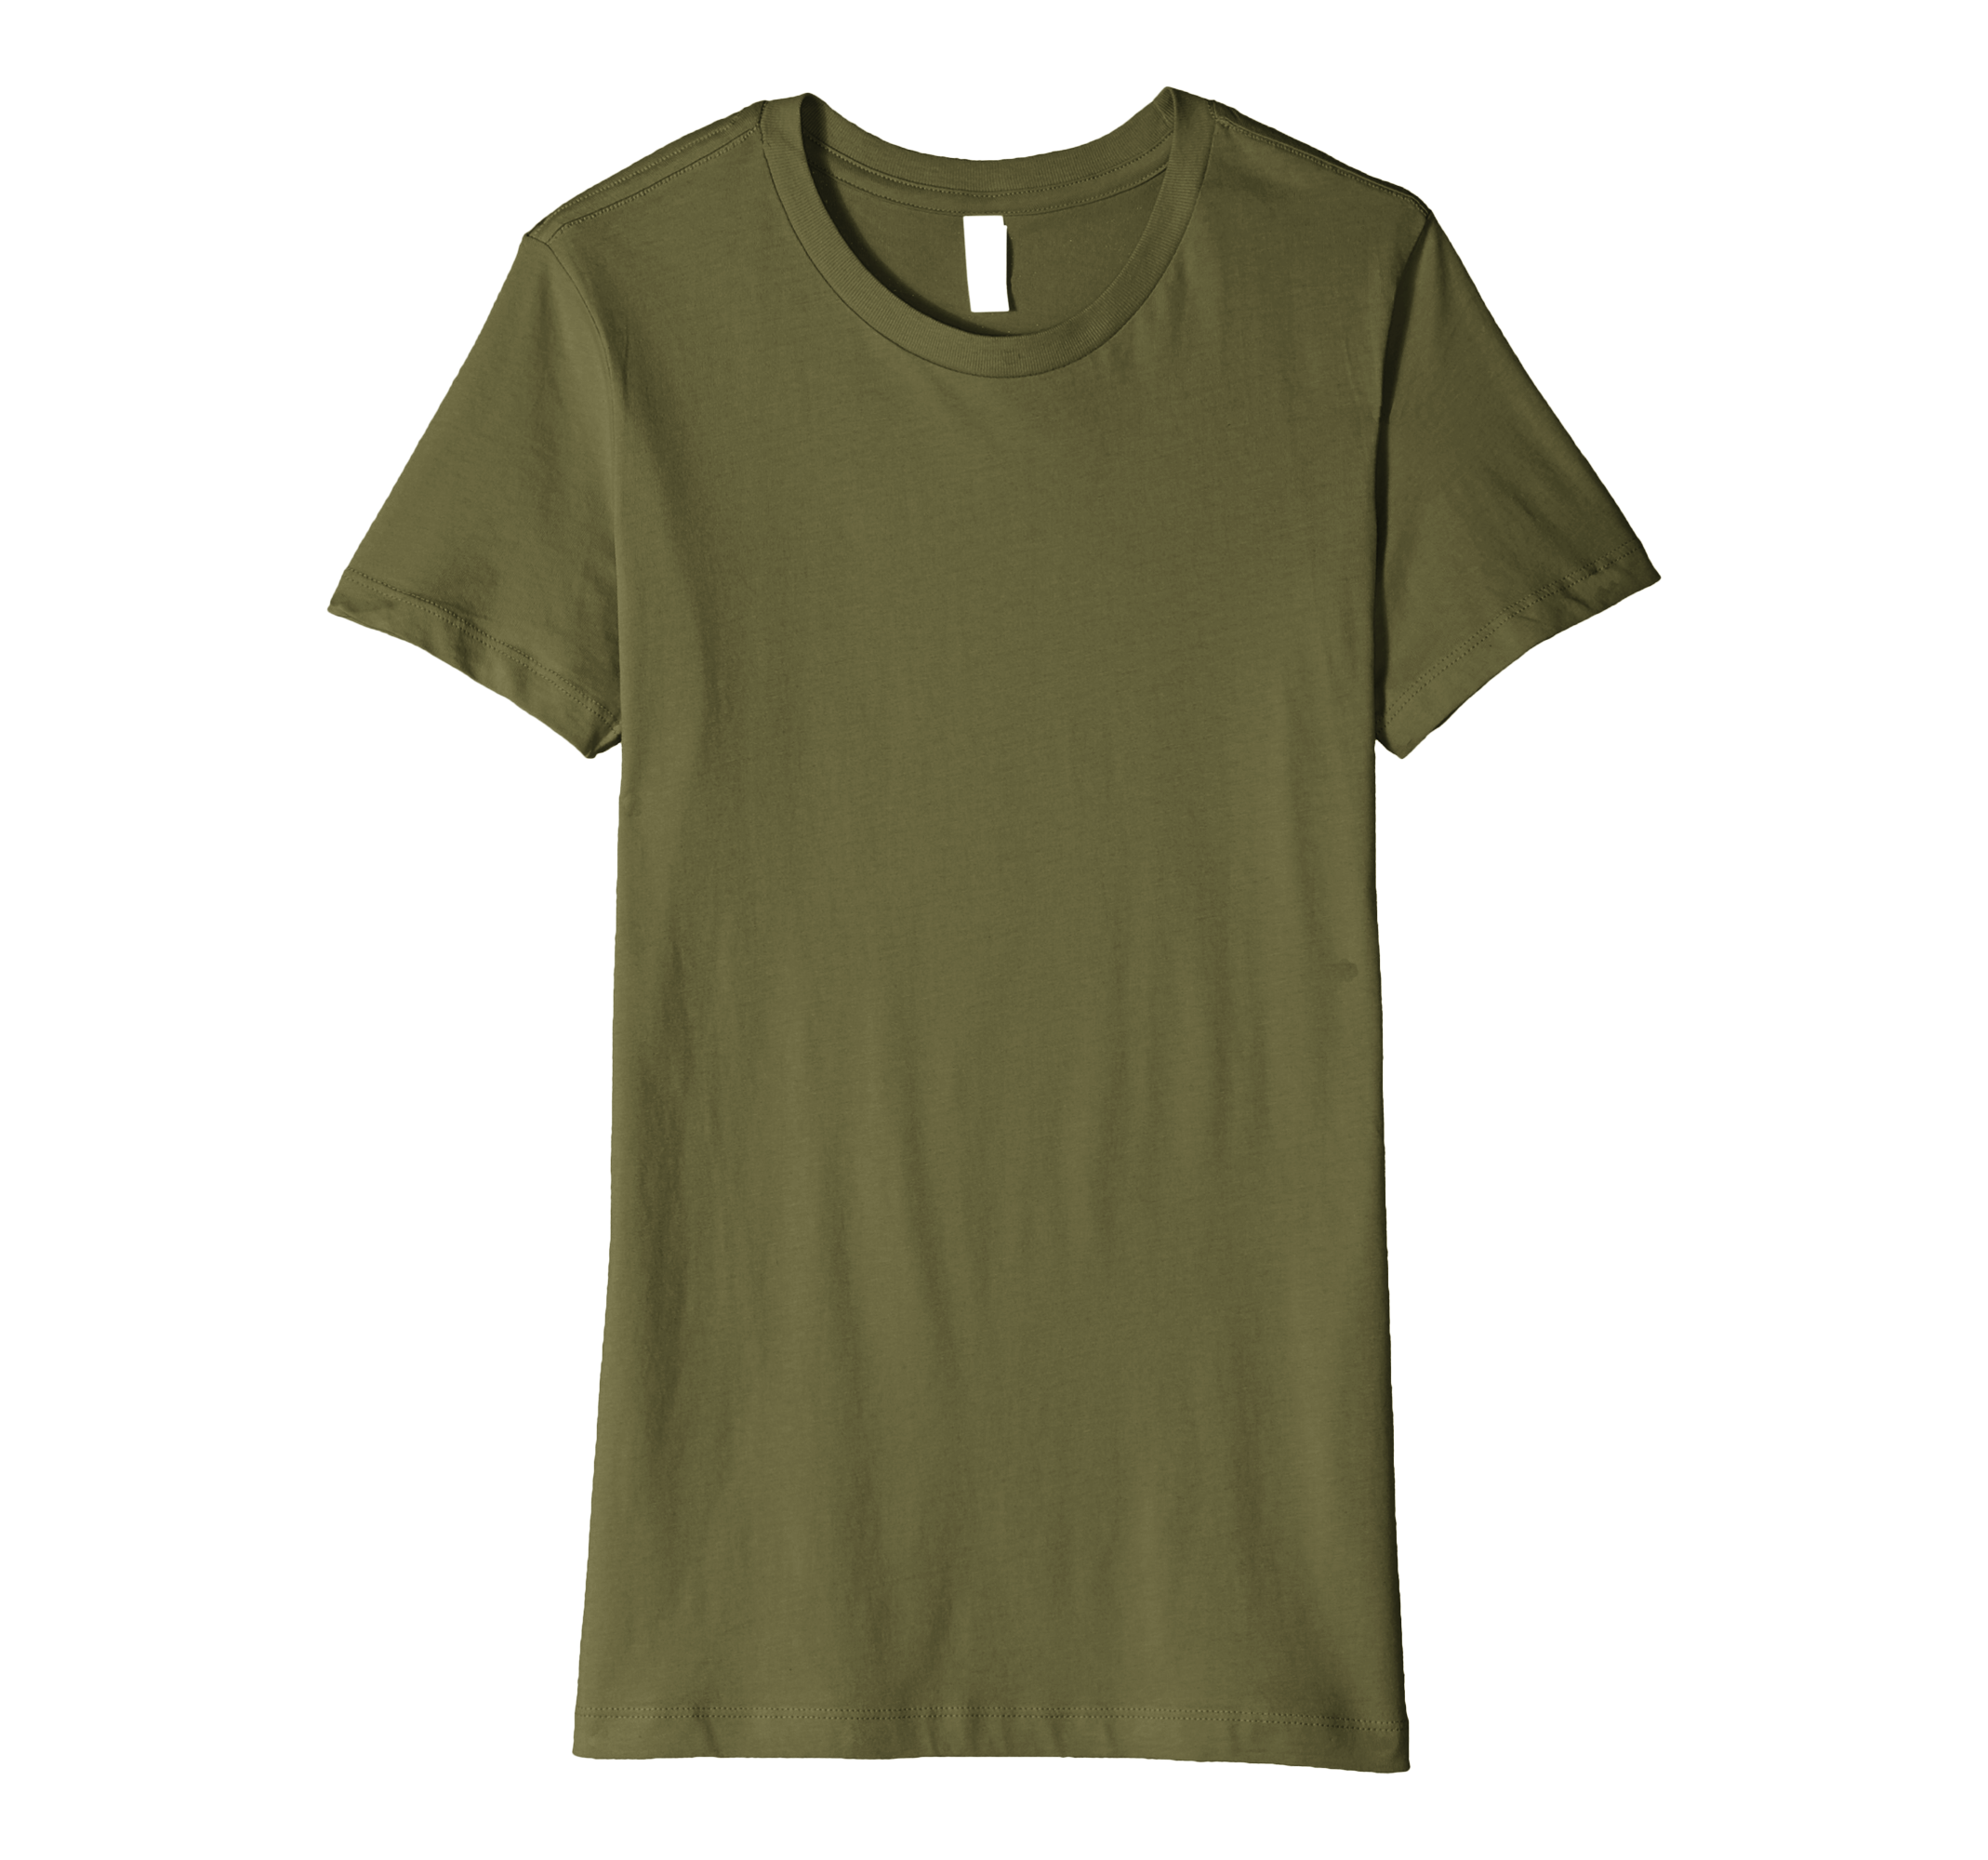 Militaria Royal Air Force Police RAF T-Shirt 100% Cotton heather grey